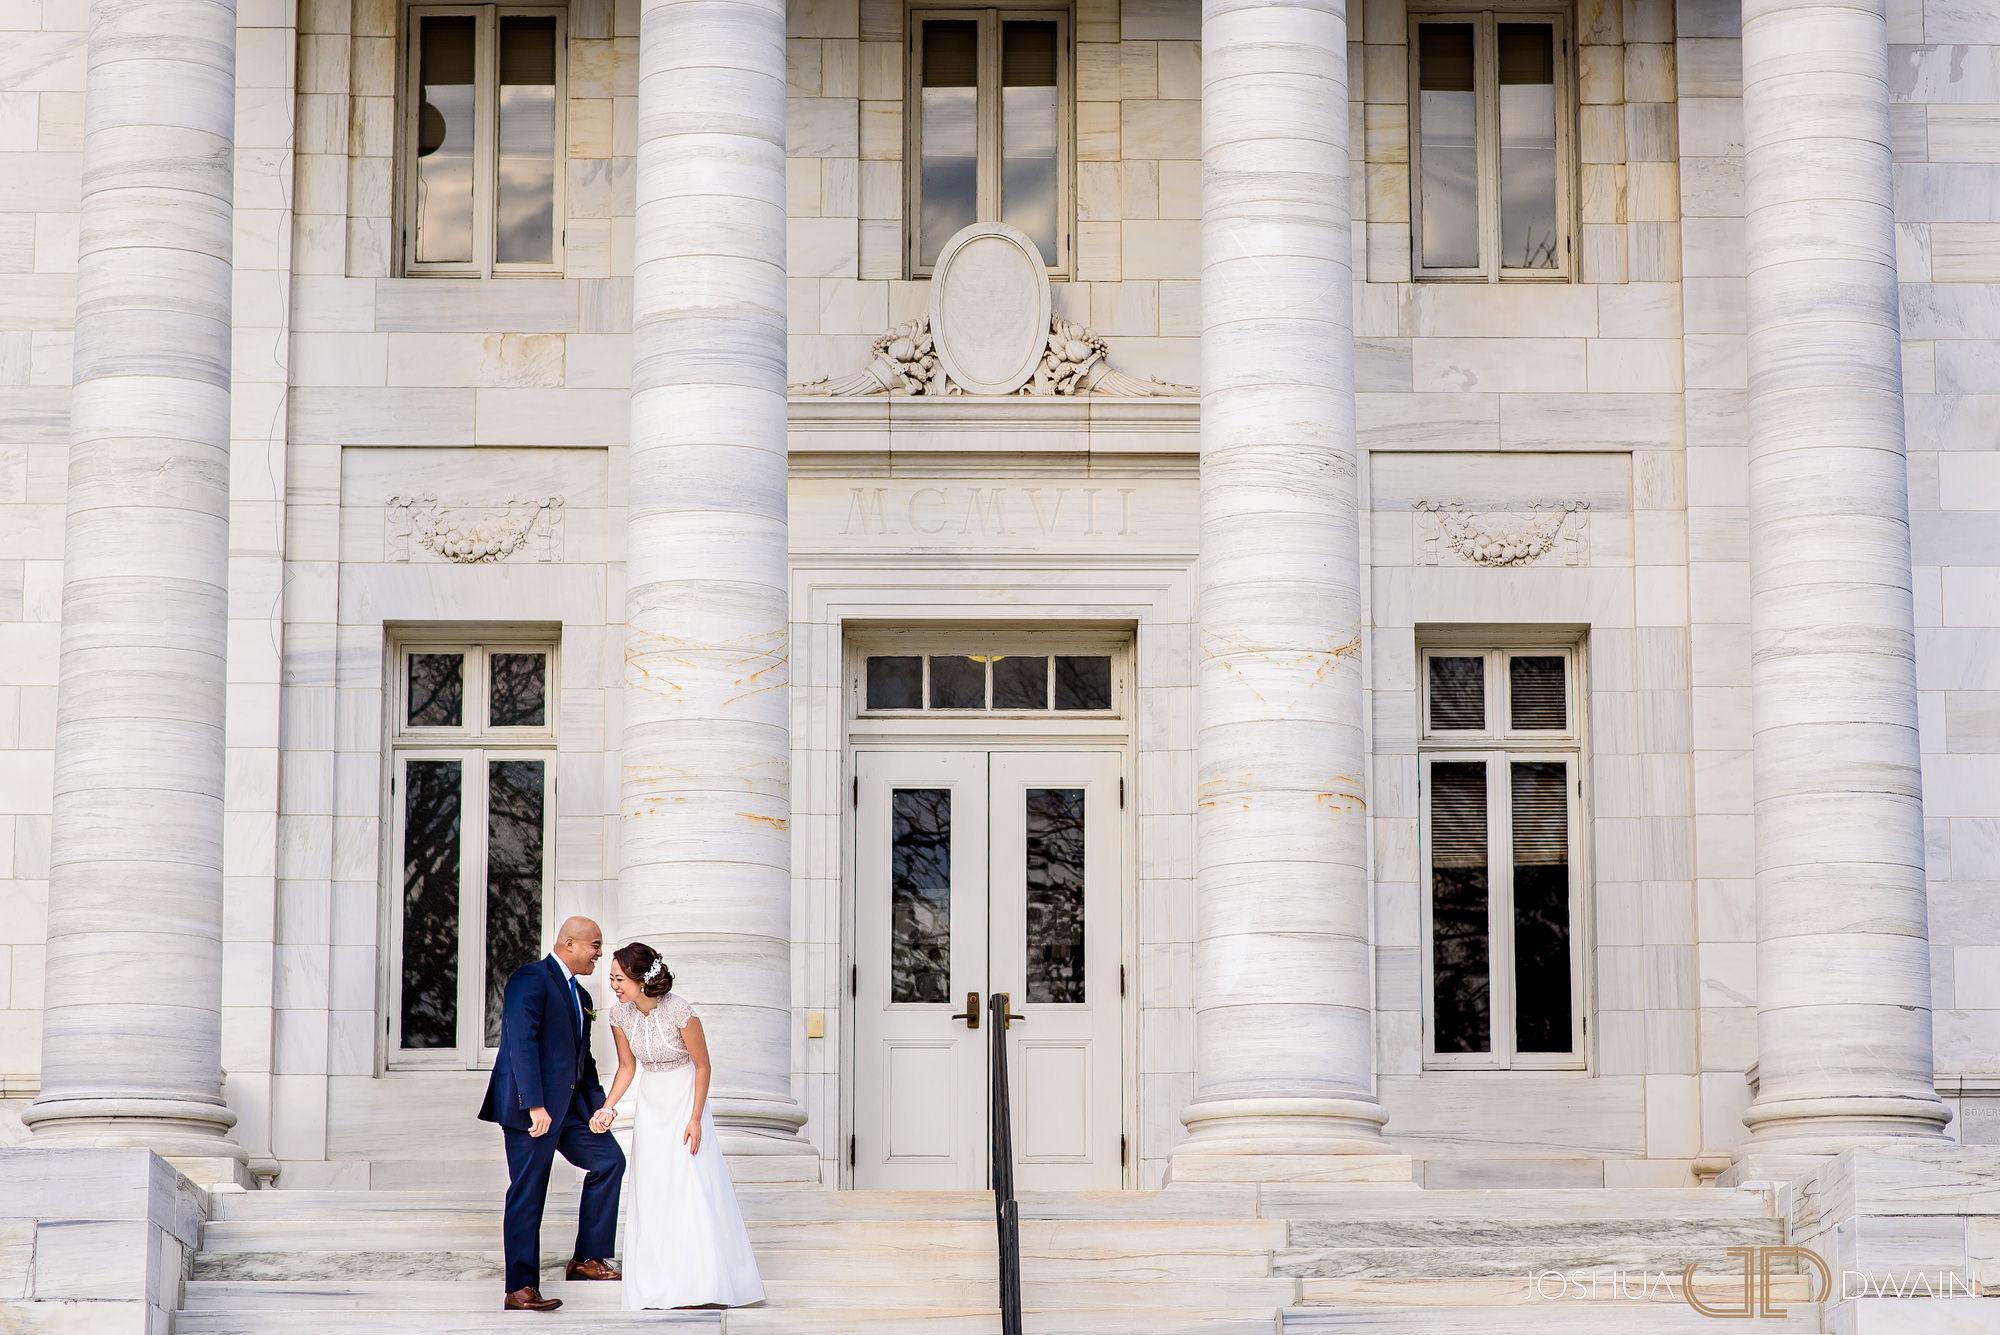 yanshu-michael-25-somerset-courthouse-elopement-wedding-joshua-dwain